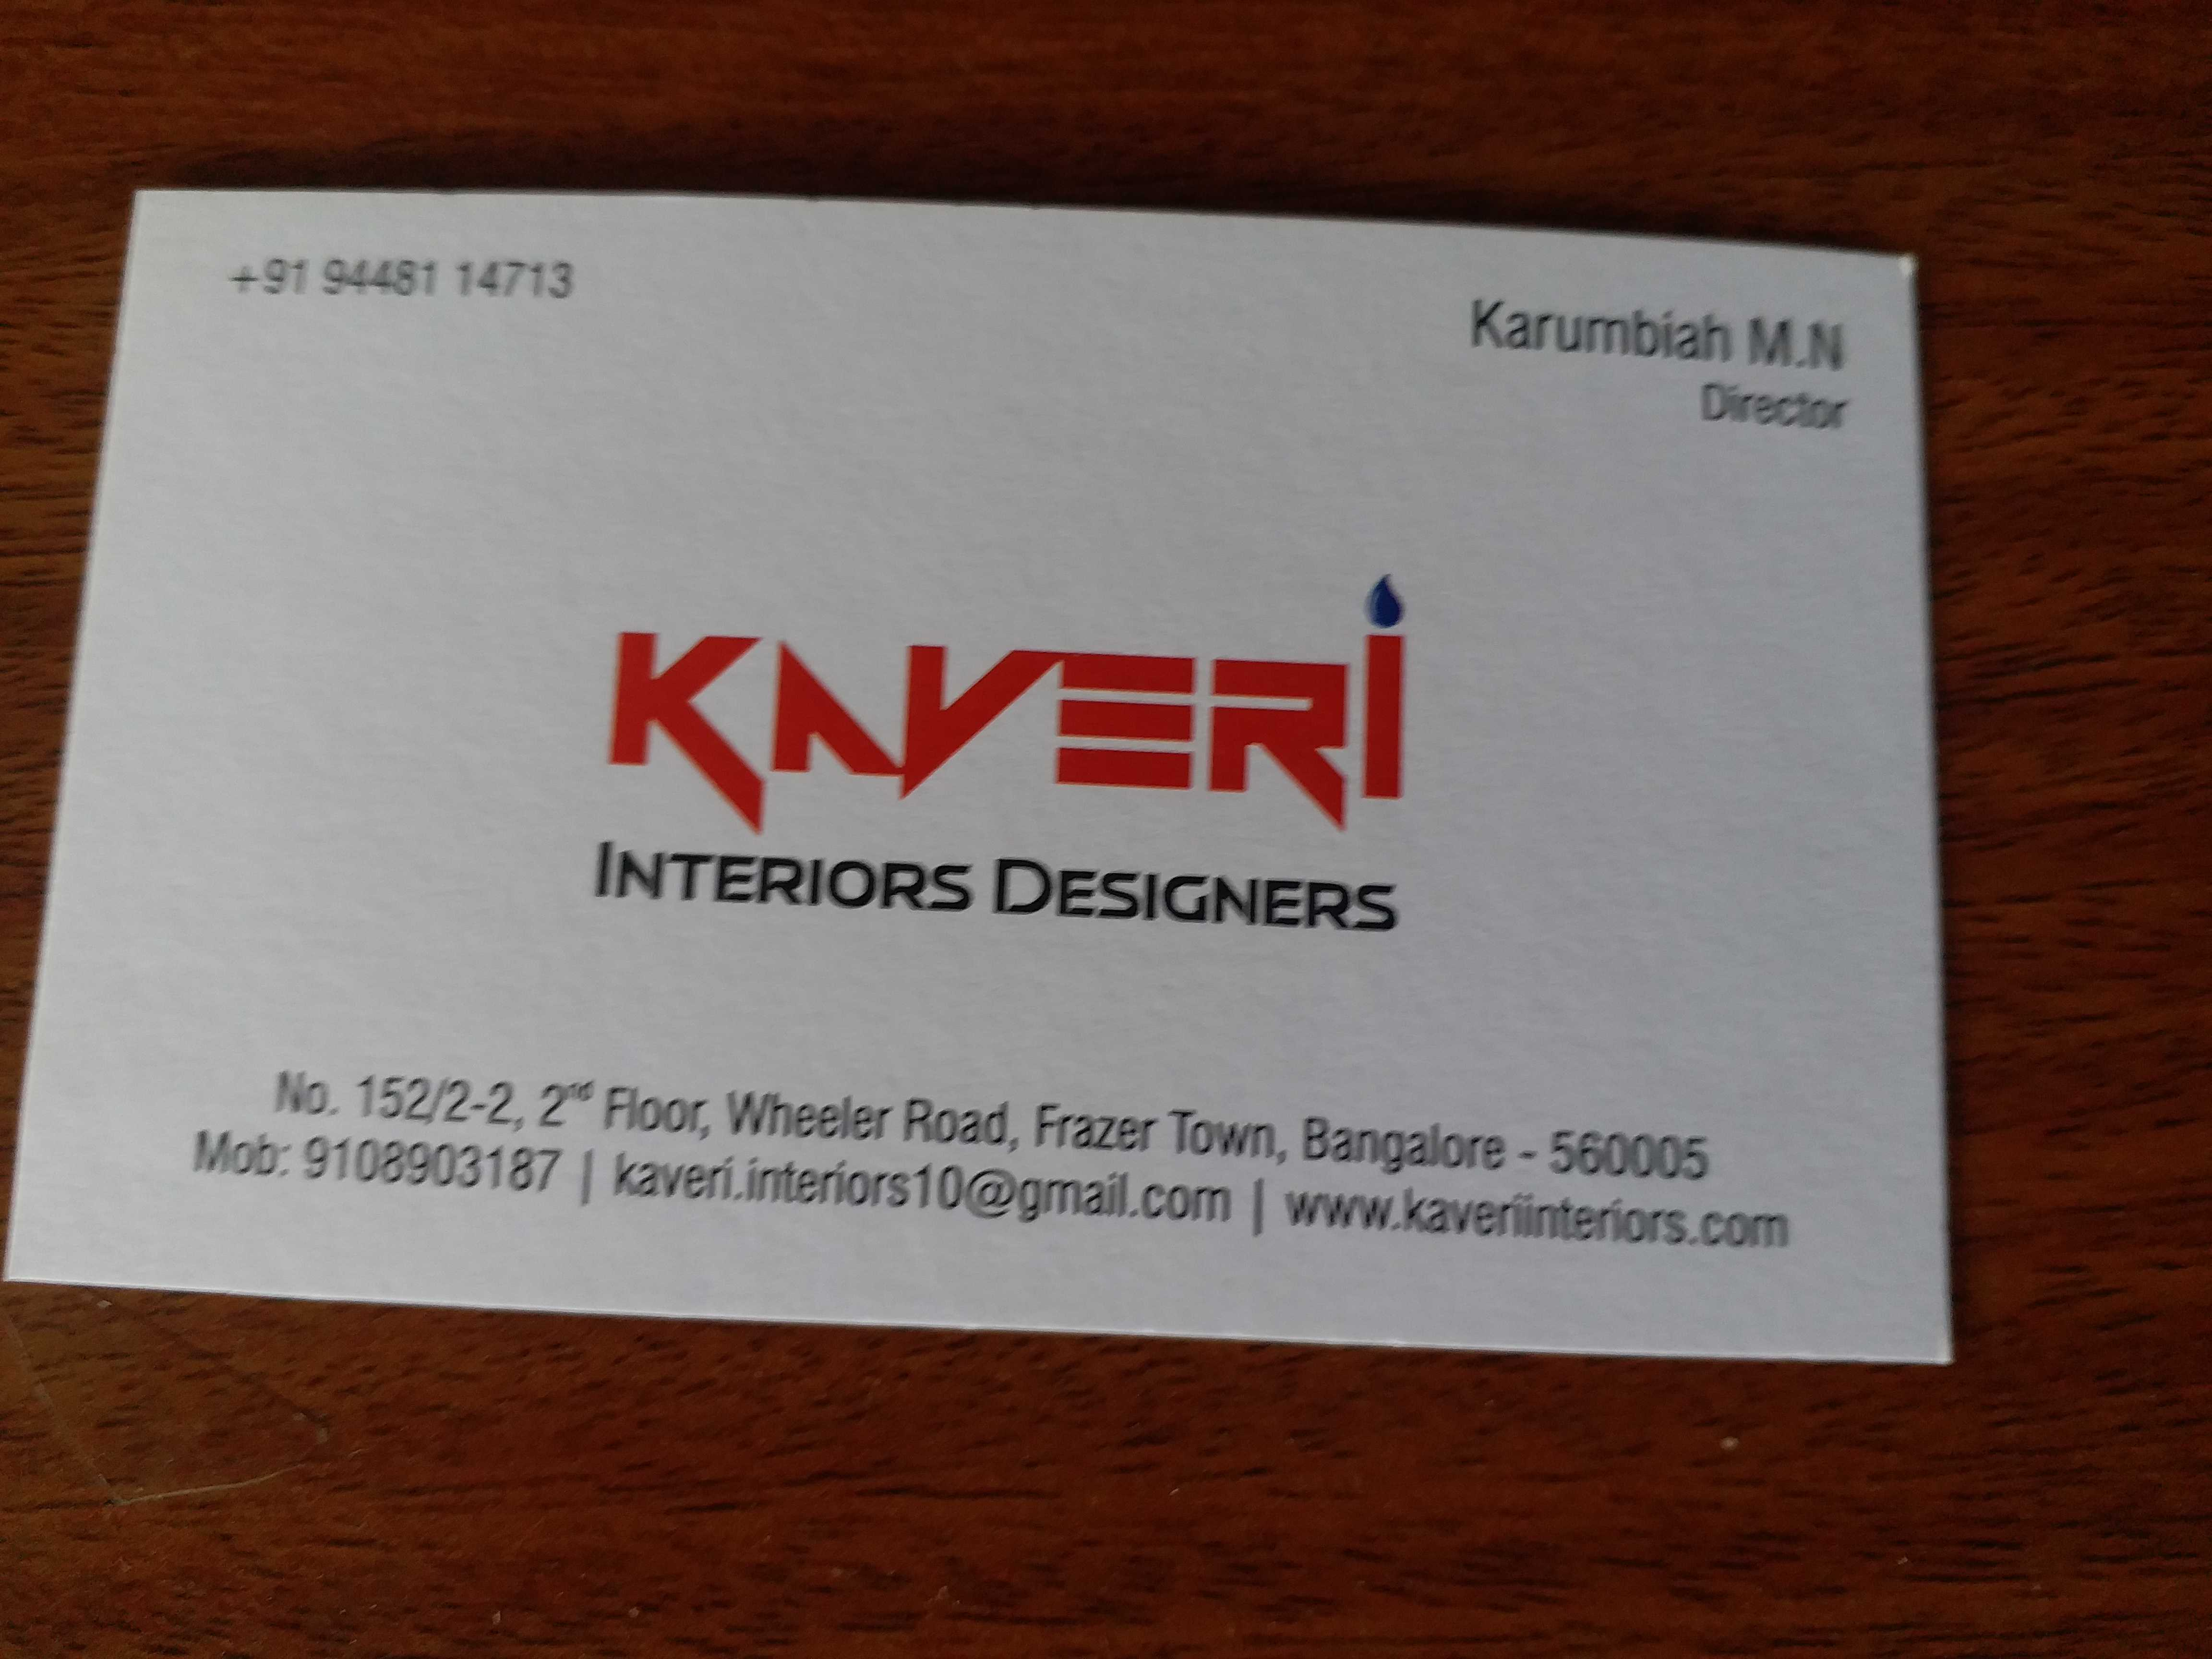 Kaveri Interiors Designers In Frazer Town Bangalore 560005 Sulekha Bangalore